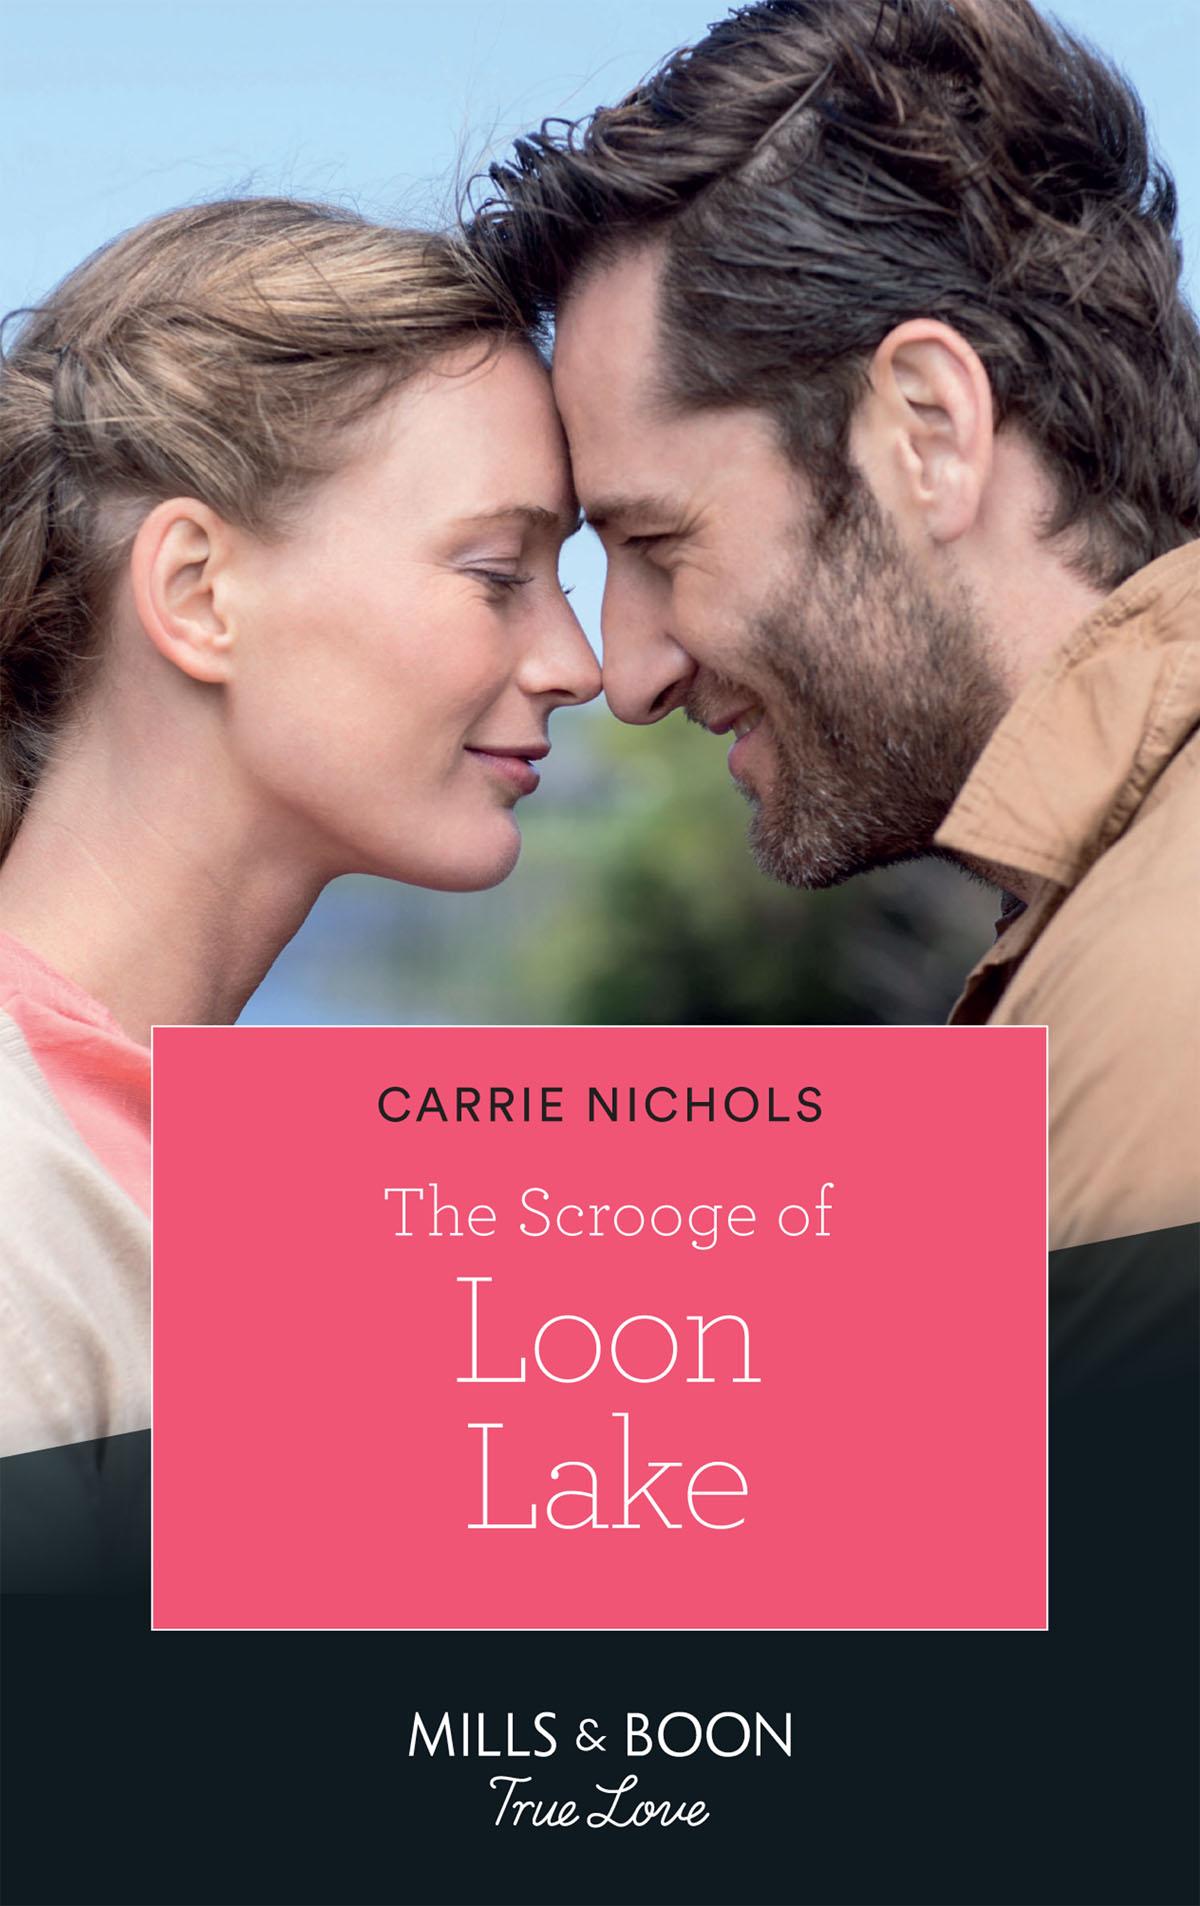 Carrie Nichols The Scrooge Of Loon Lake mandi solk the joy of no self